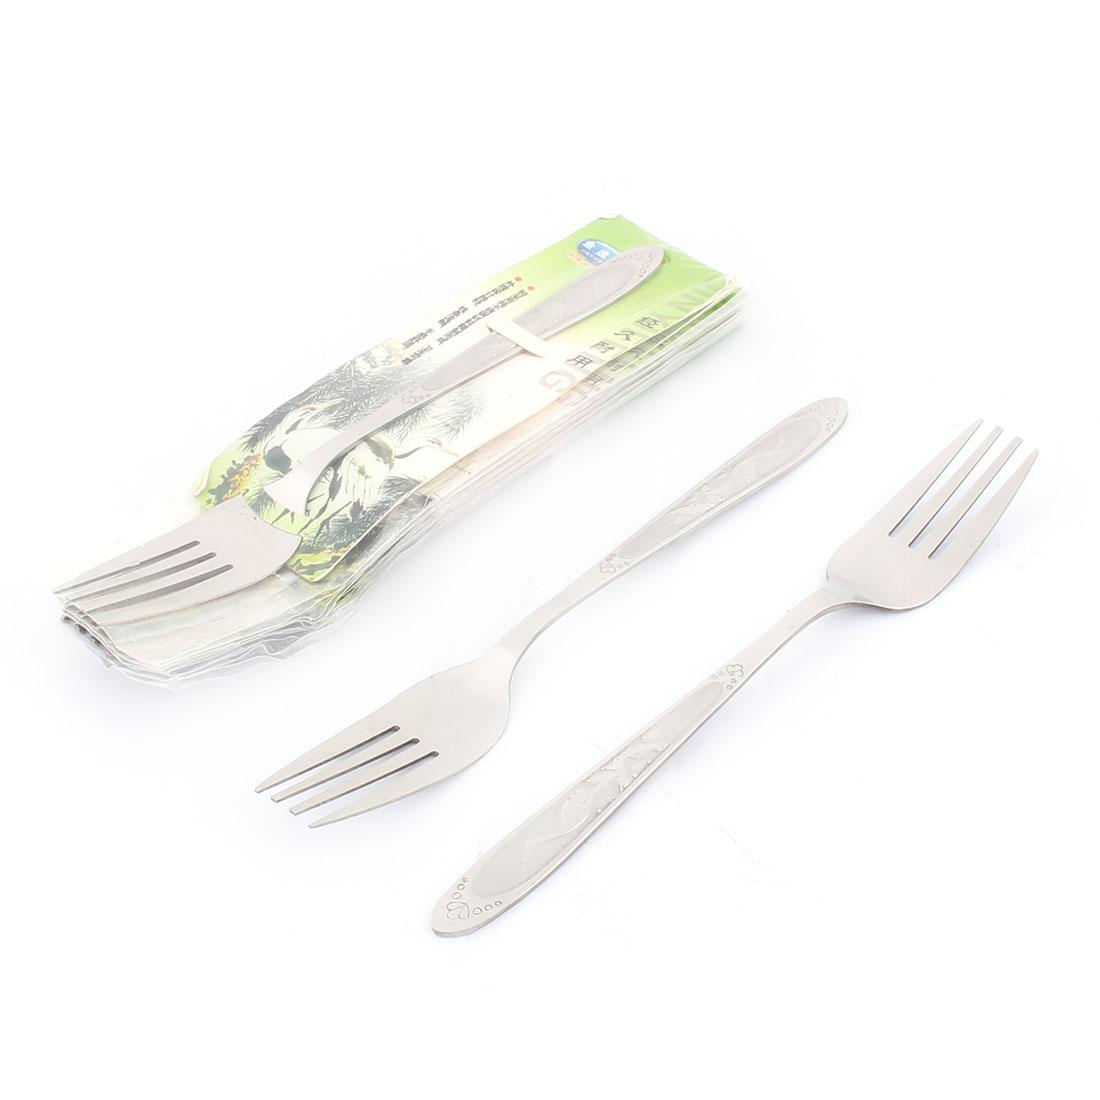 Household Tableware Stainless Steel Dinner Fork 7.3 Inches Length 8 Pcs